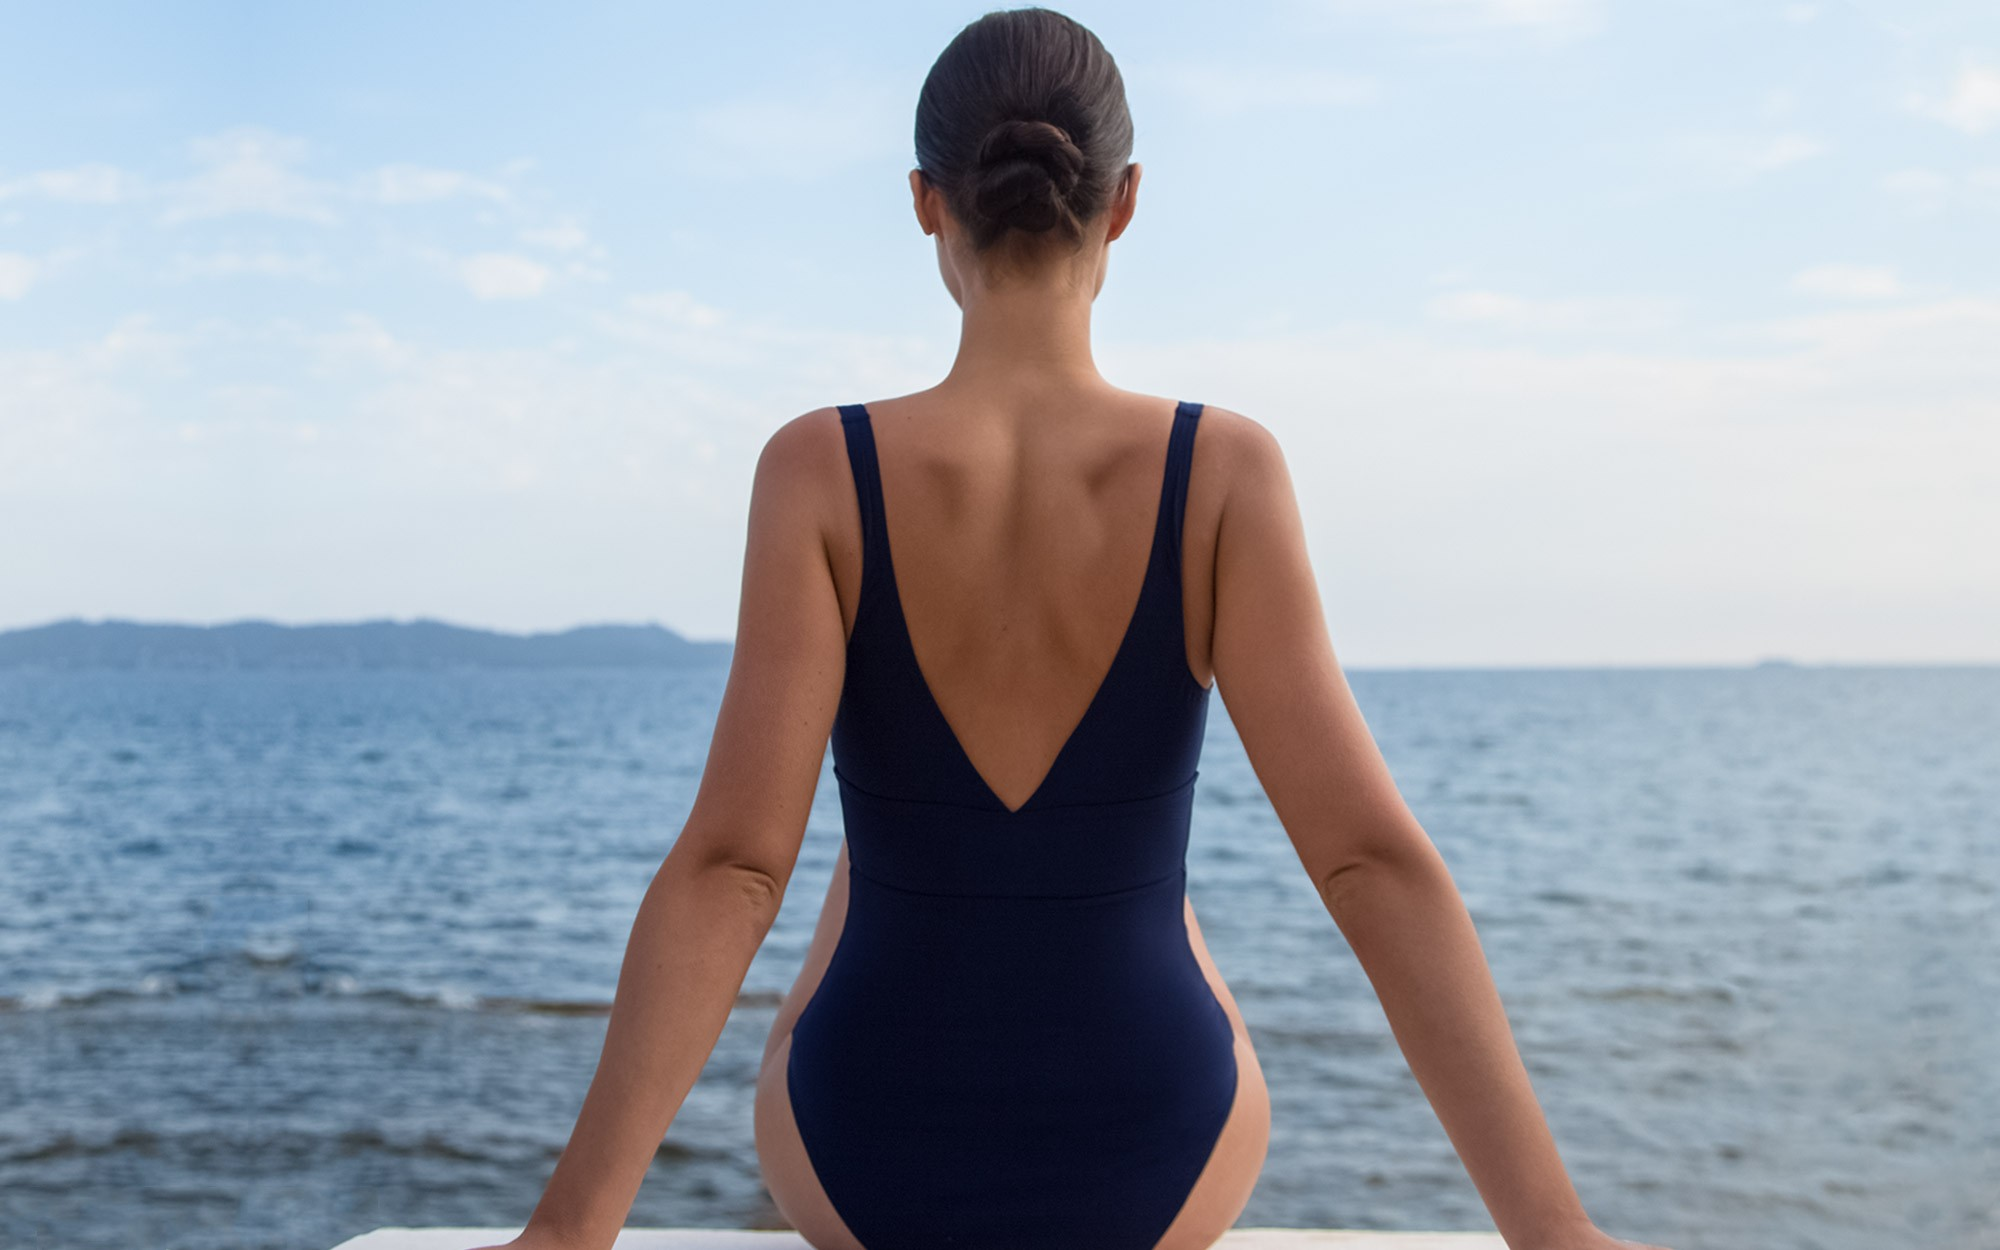 The navy swimsuit